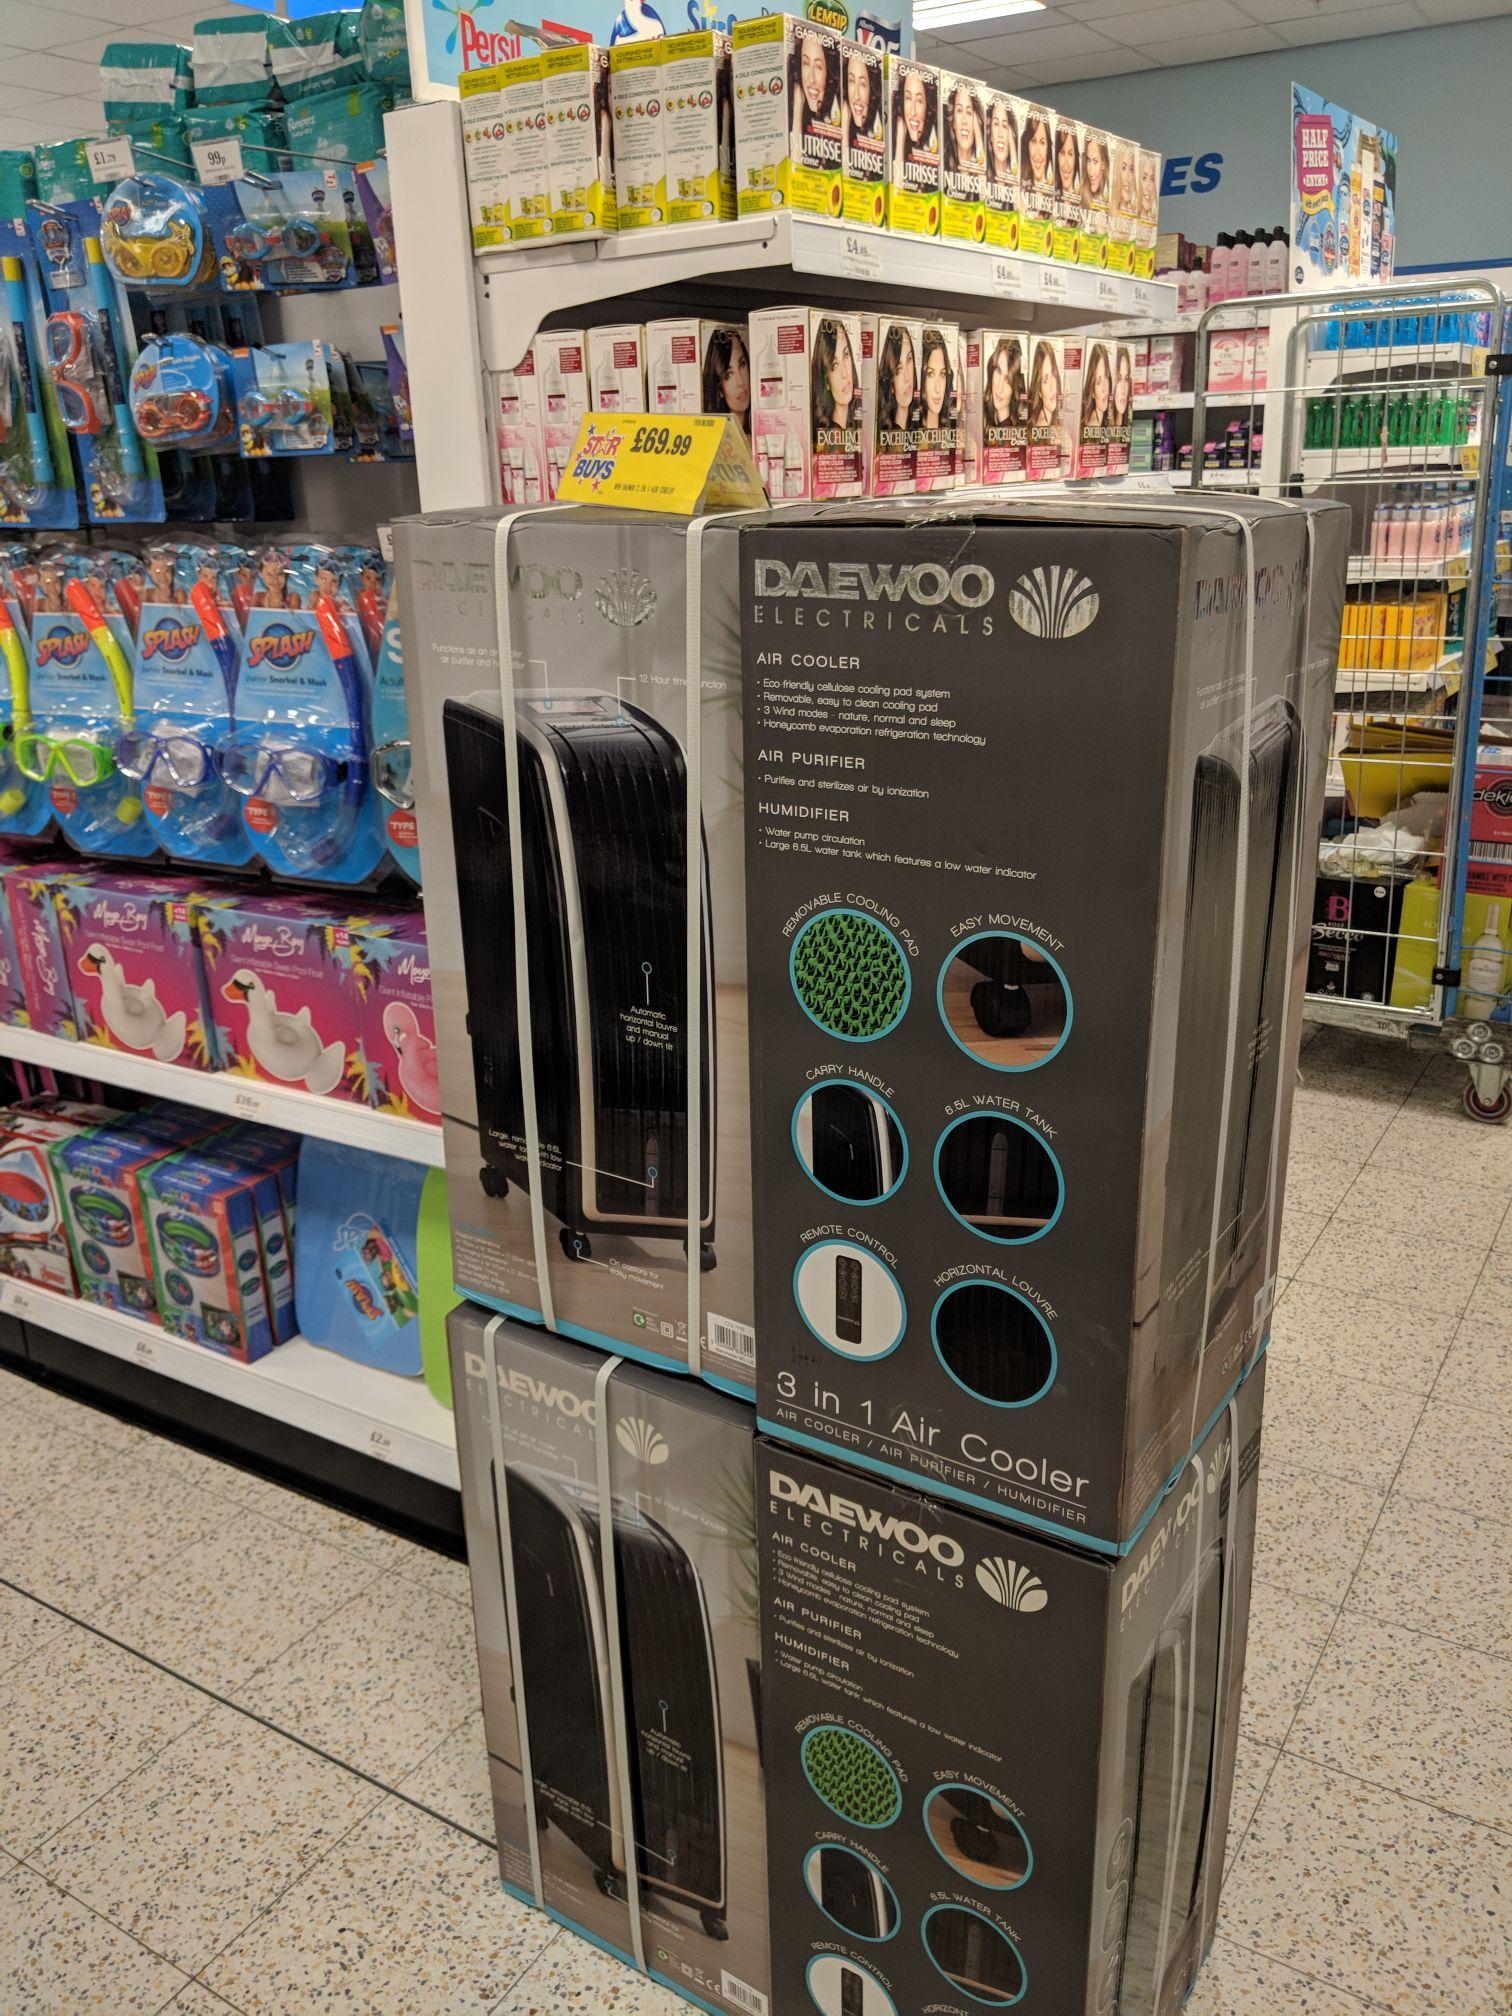 Daewoo Portable 6.5L 4-in-1 Air Cooler, Fan Heater, Air Purifier & Humidifier - BLACK 69.99 instore @ home bargains